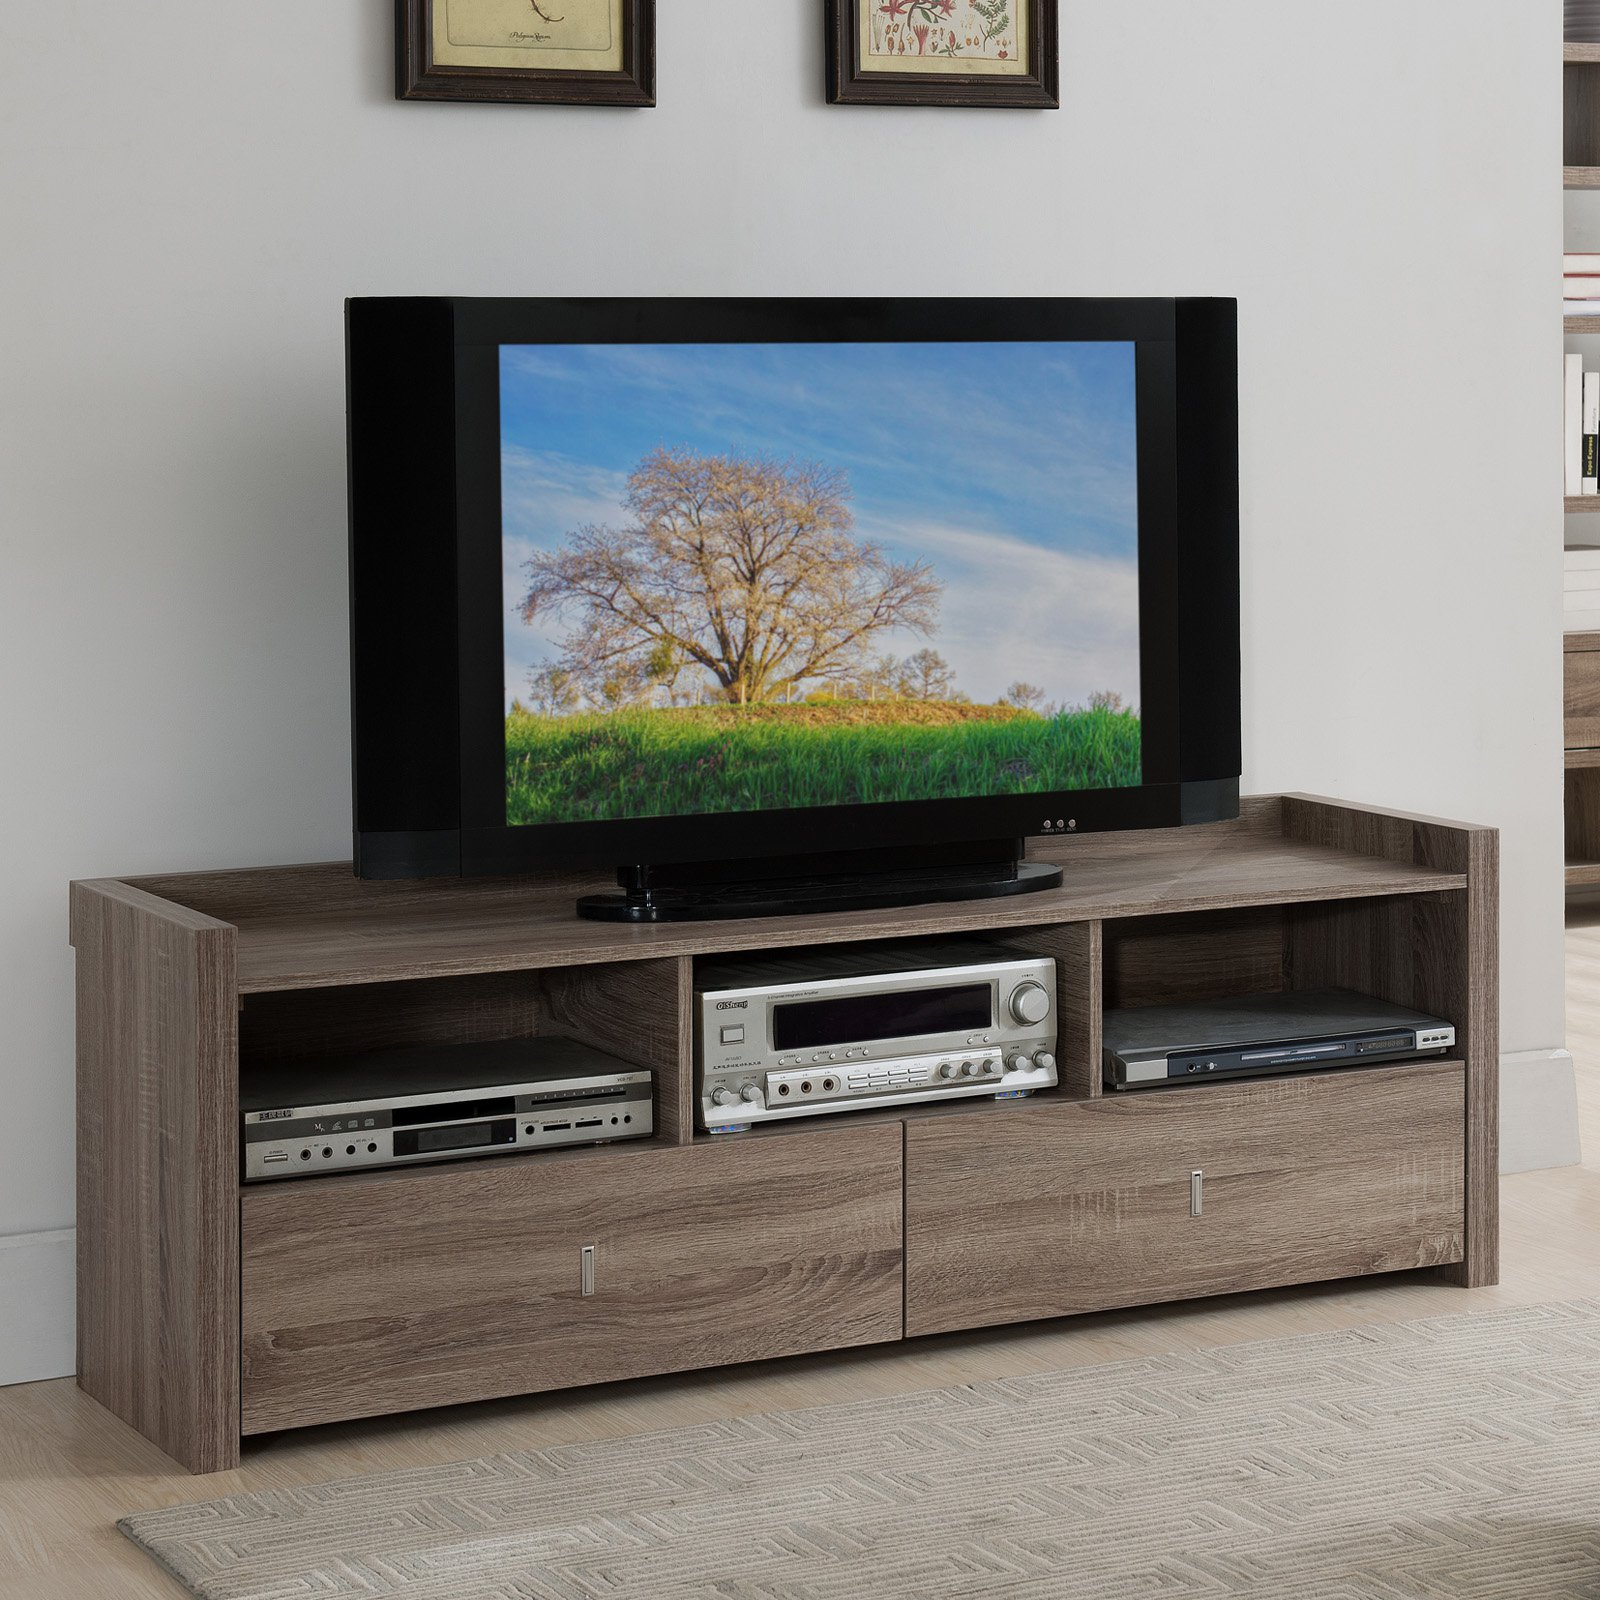 Furniture Of America Parker Multi Storage TV Stand   Light Oak   Walmart.com